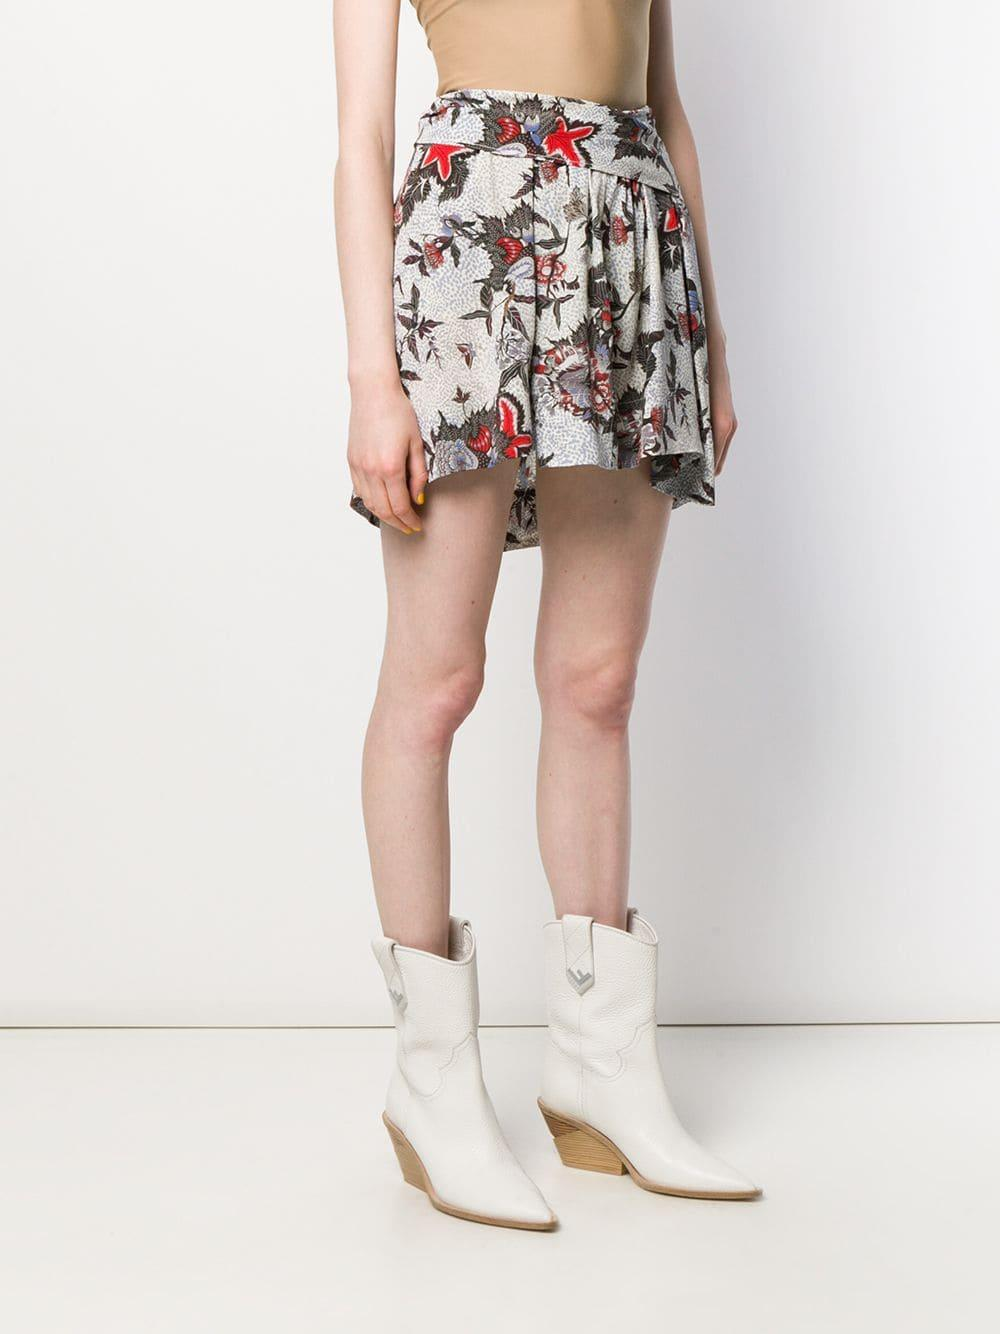 Minifalda estampada Isabel Marant de Tejido sintético